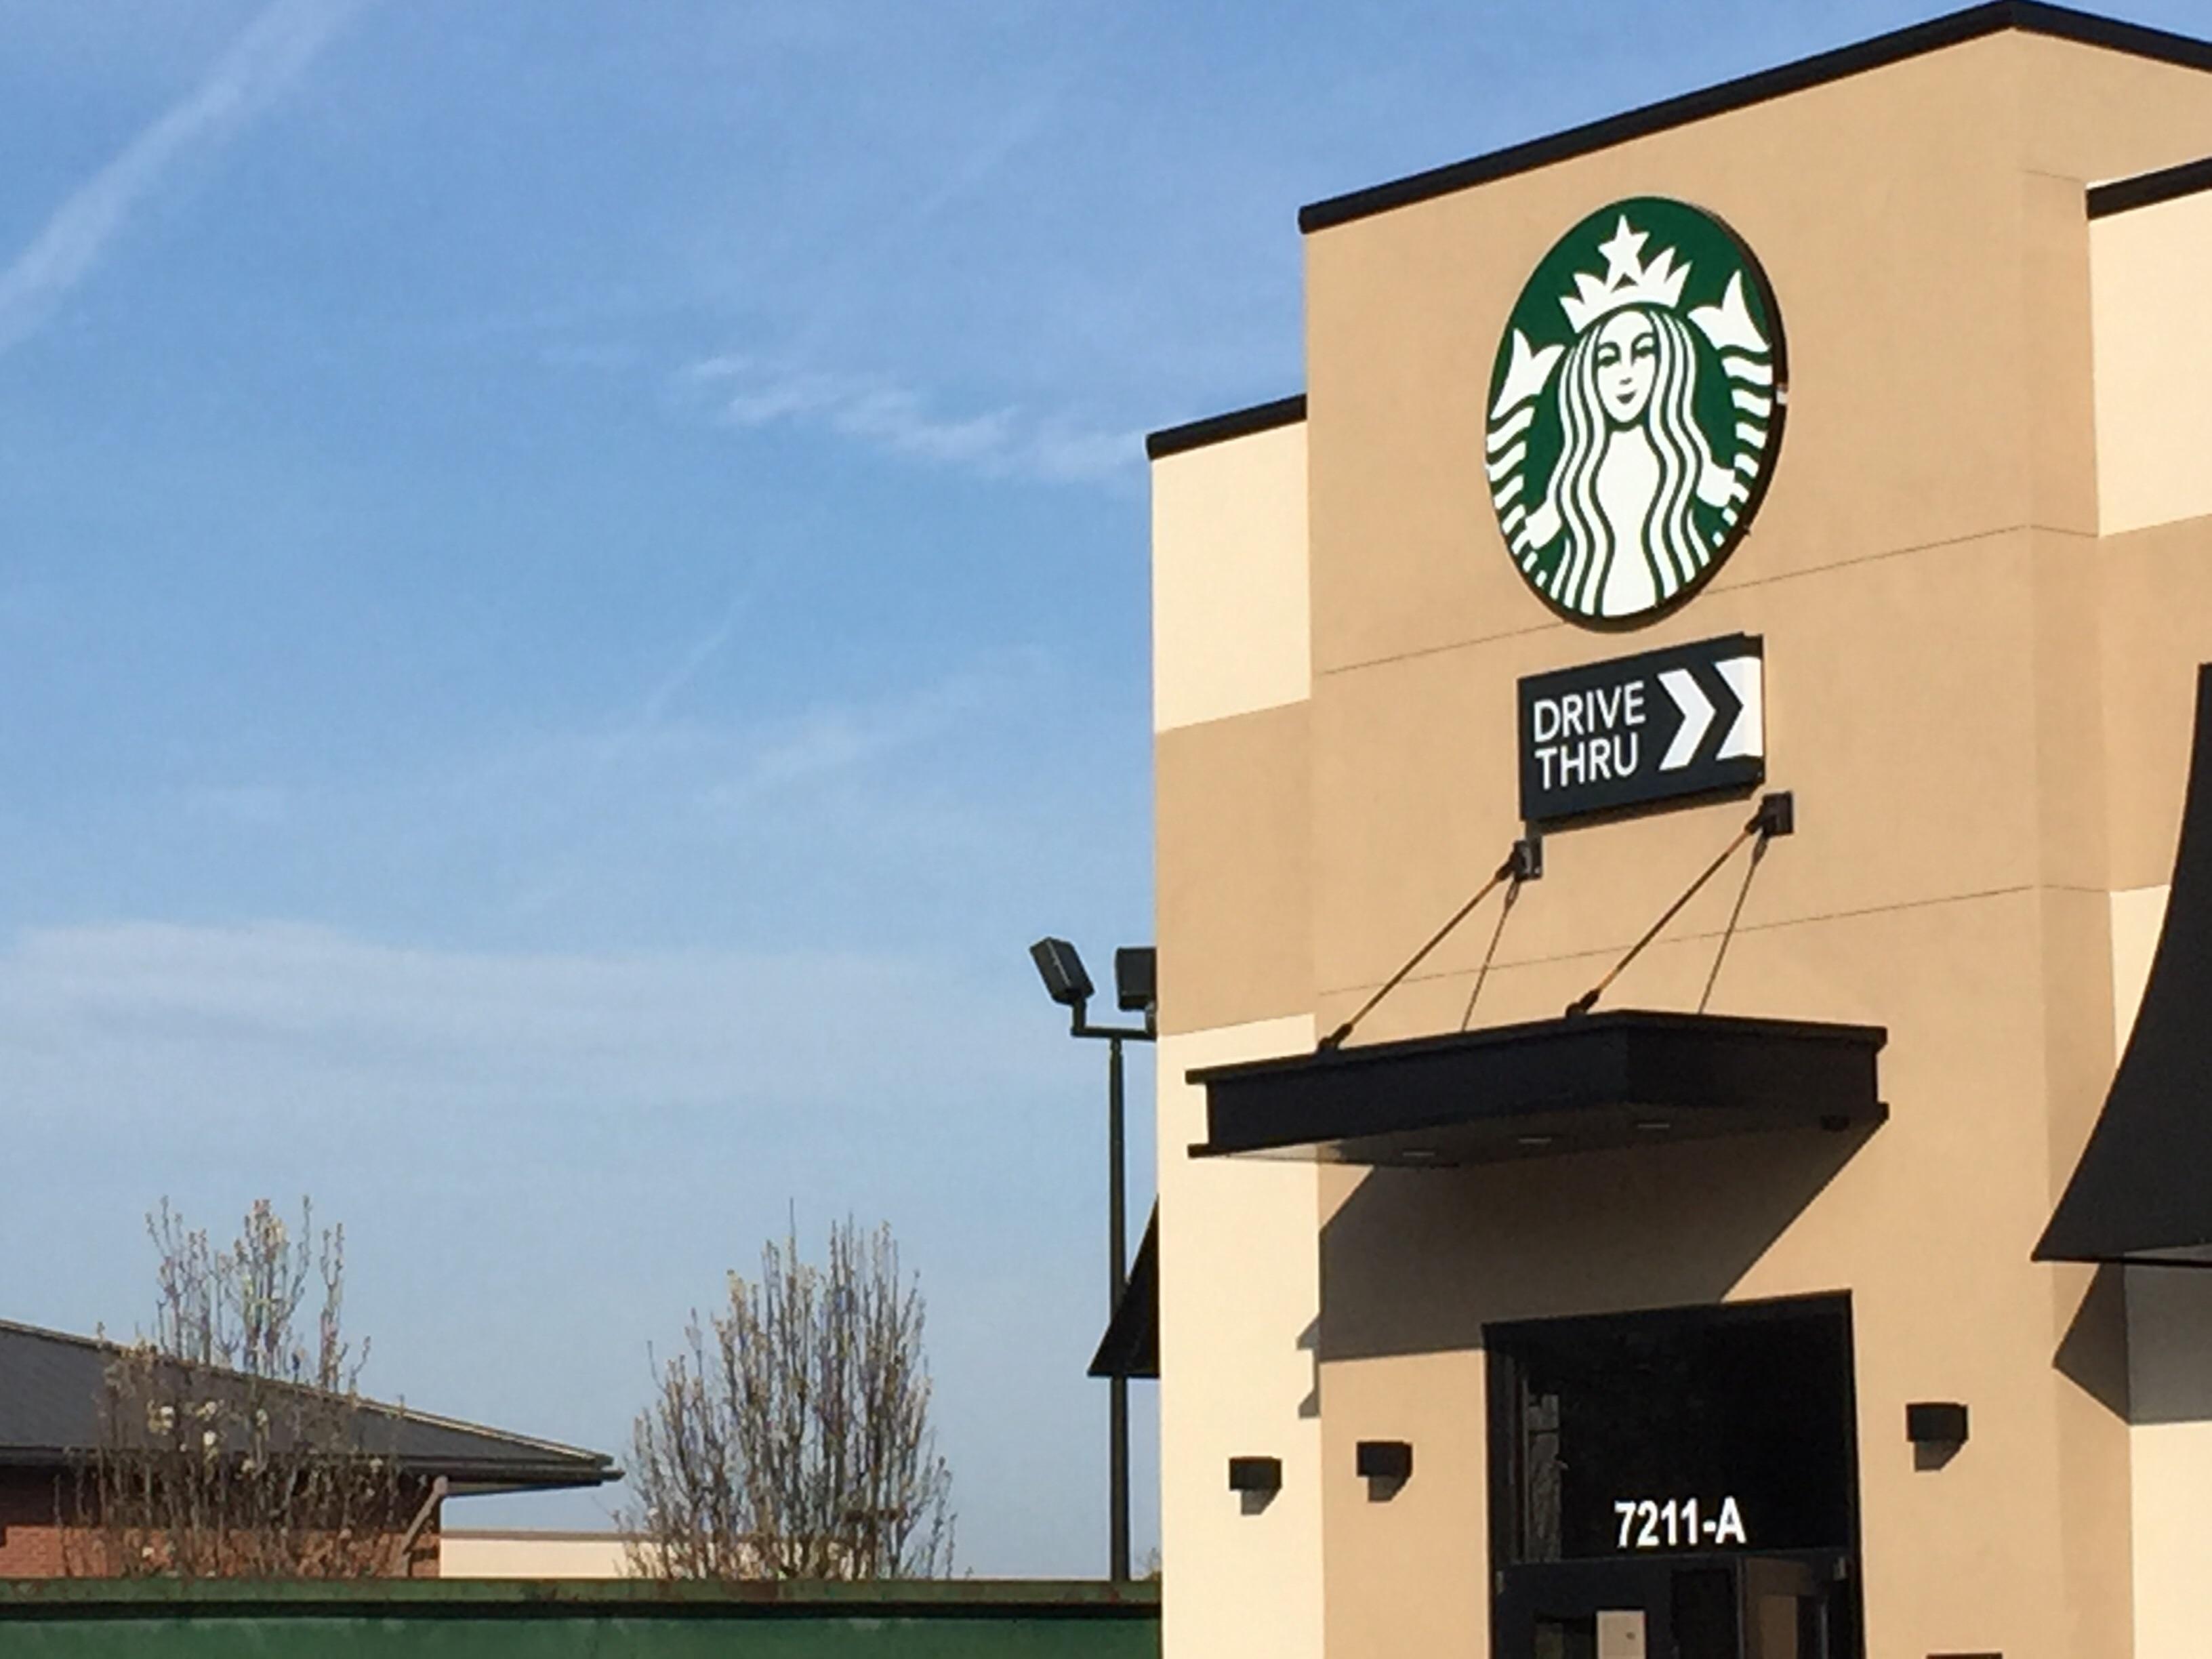 Starbucks\' Corporate Boulevard location moving down the block